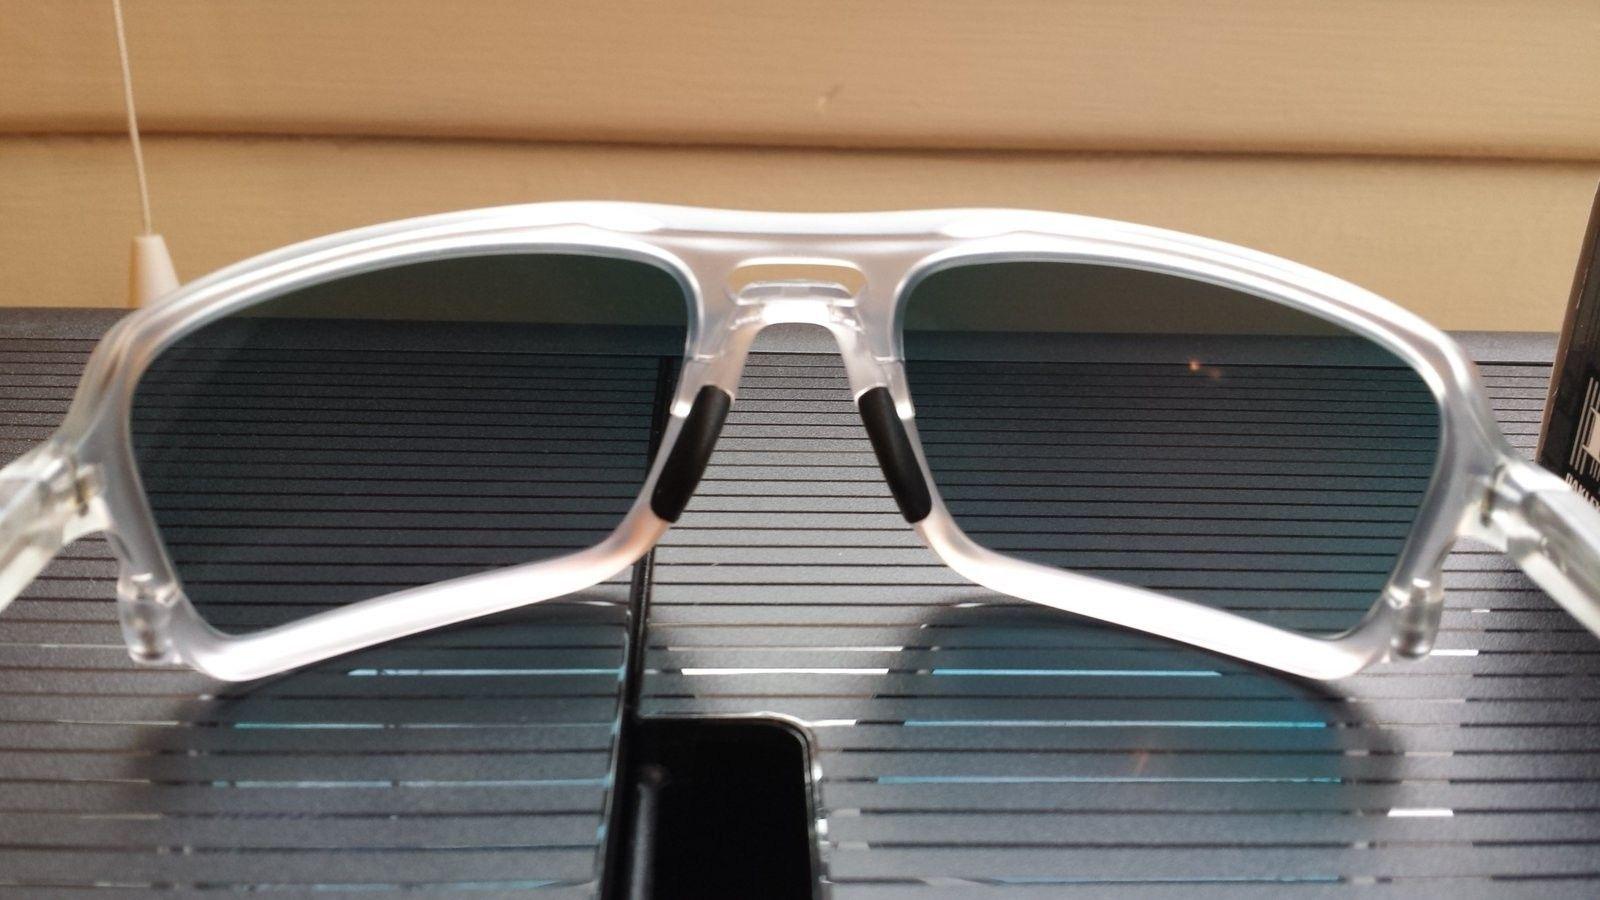 Matte Clear/ Torch Triggerman - 20160612_133124.jpg